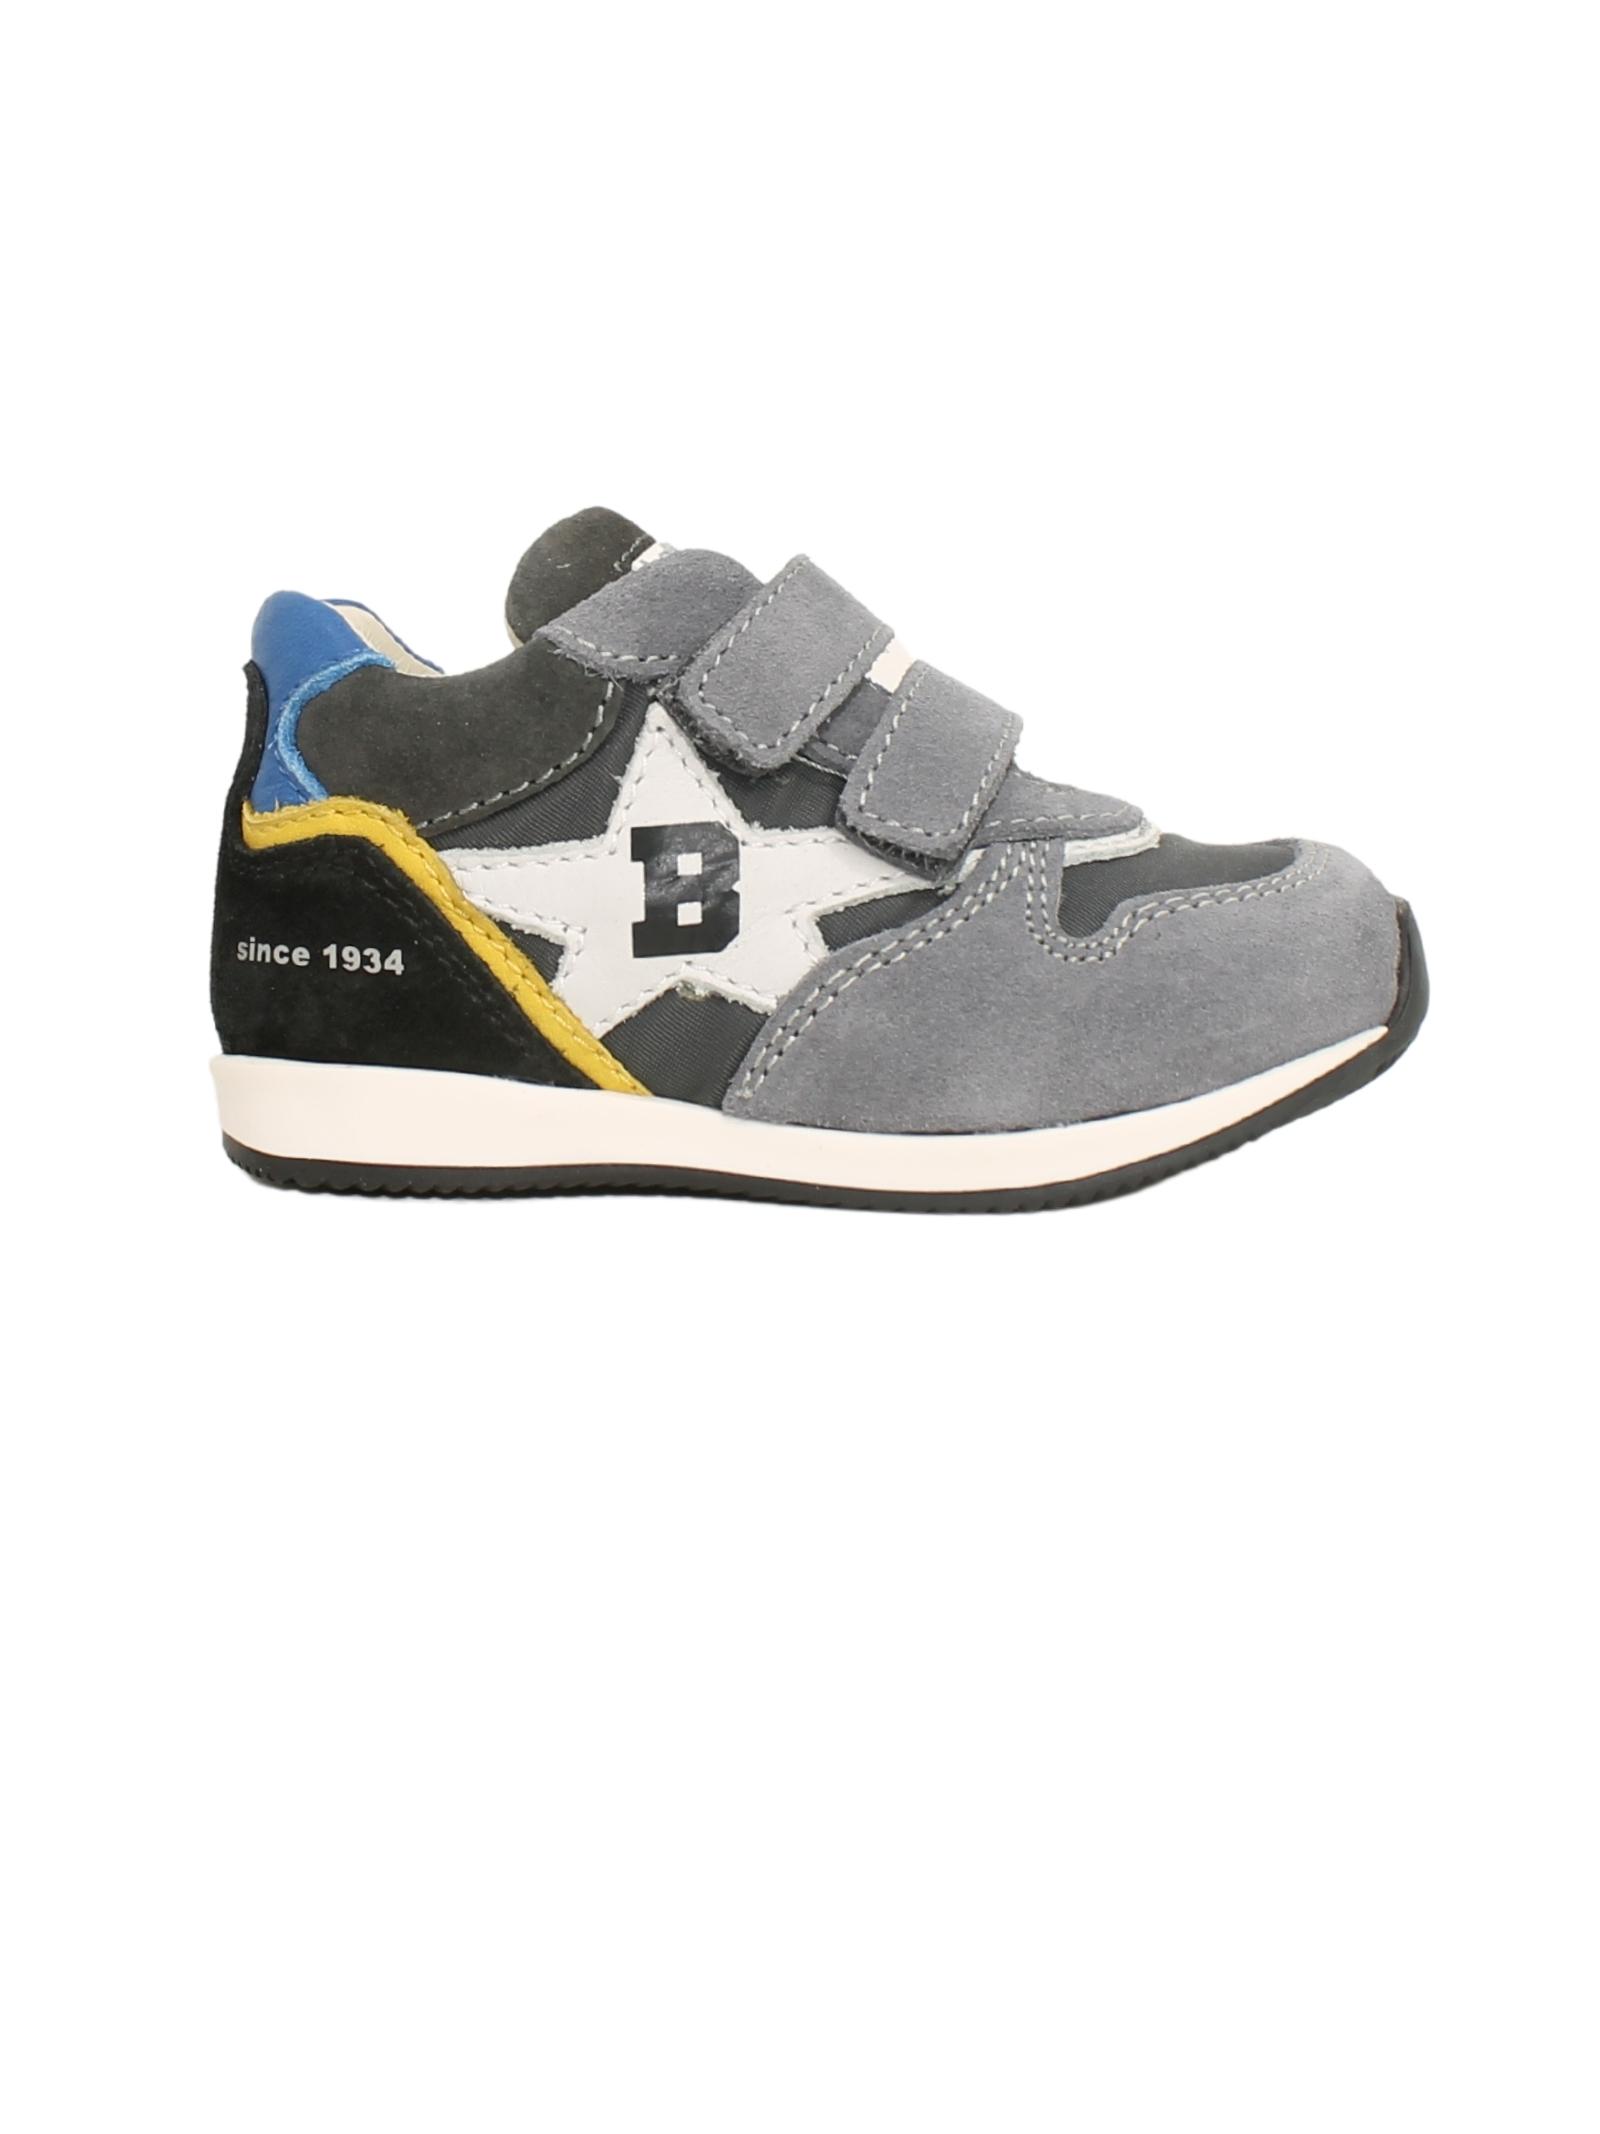 Sneakers Fantasy Bambino BALDUCCI | Sneakers | CSPO4652GRIGIO